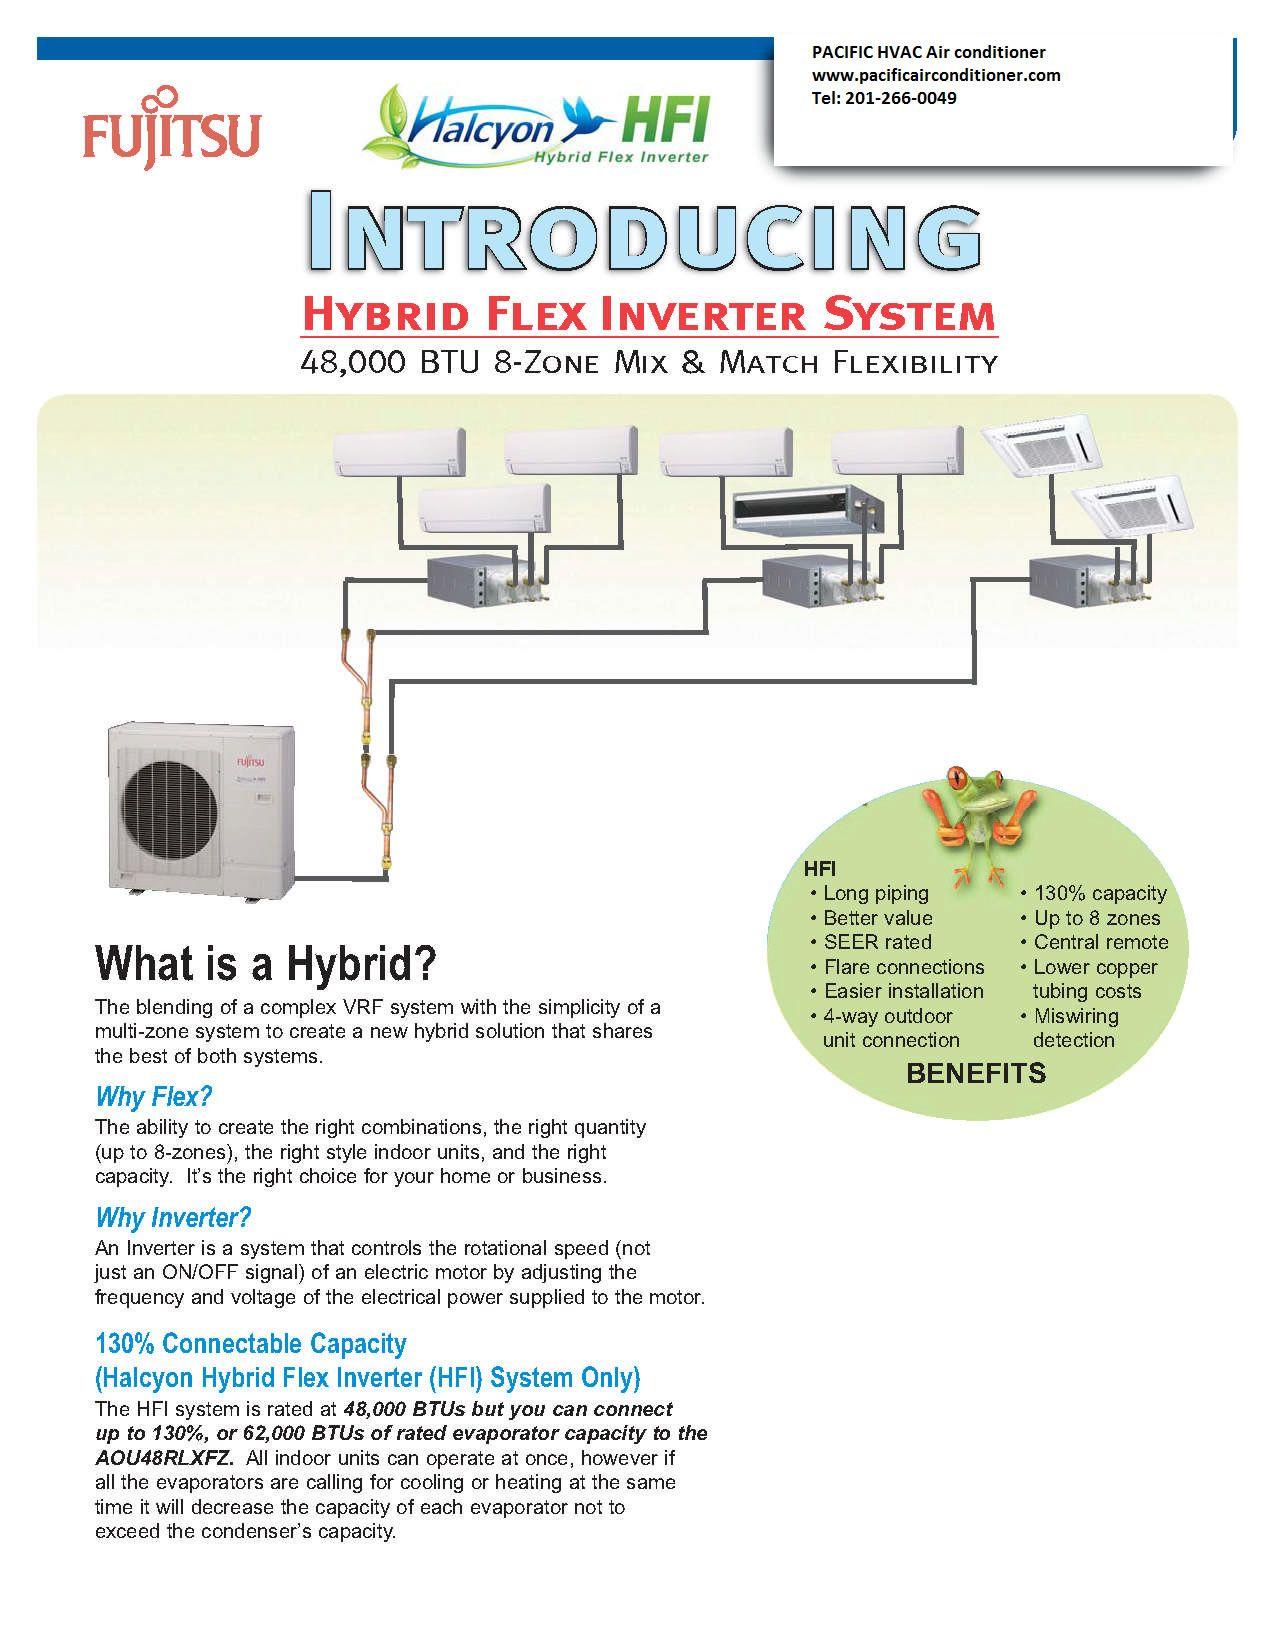 Fujitsu Multi Zone Wiring Diagram - Auto Electrical Wiring Diagram on